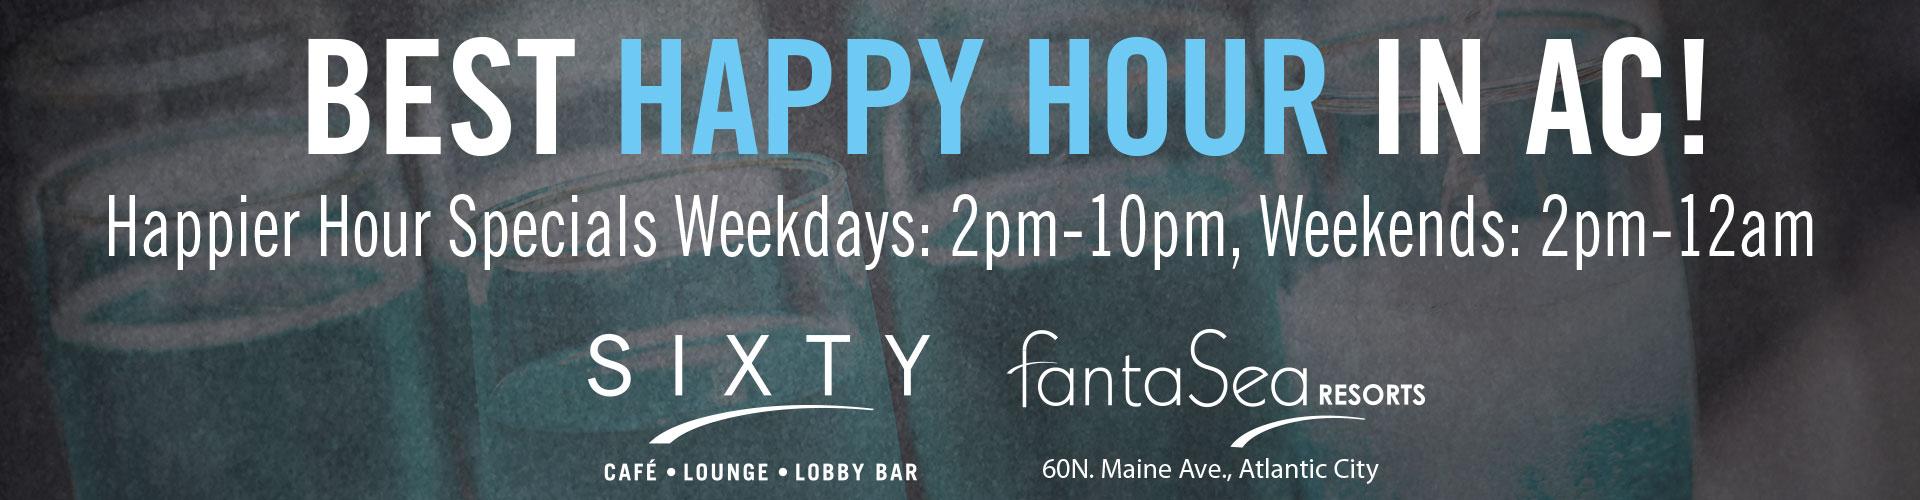 Drinks Menu - Sixty Cafe & Bar - FantaSea Resorts - Atlantic City, NJ